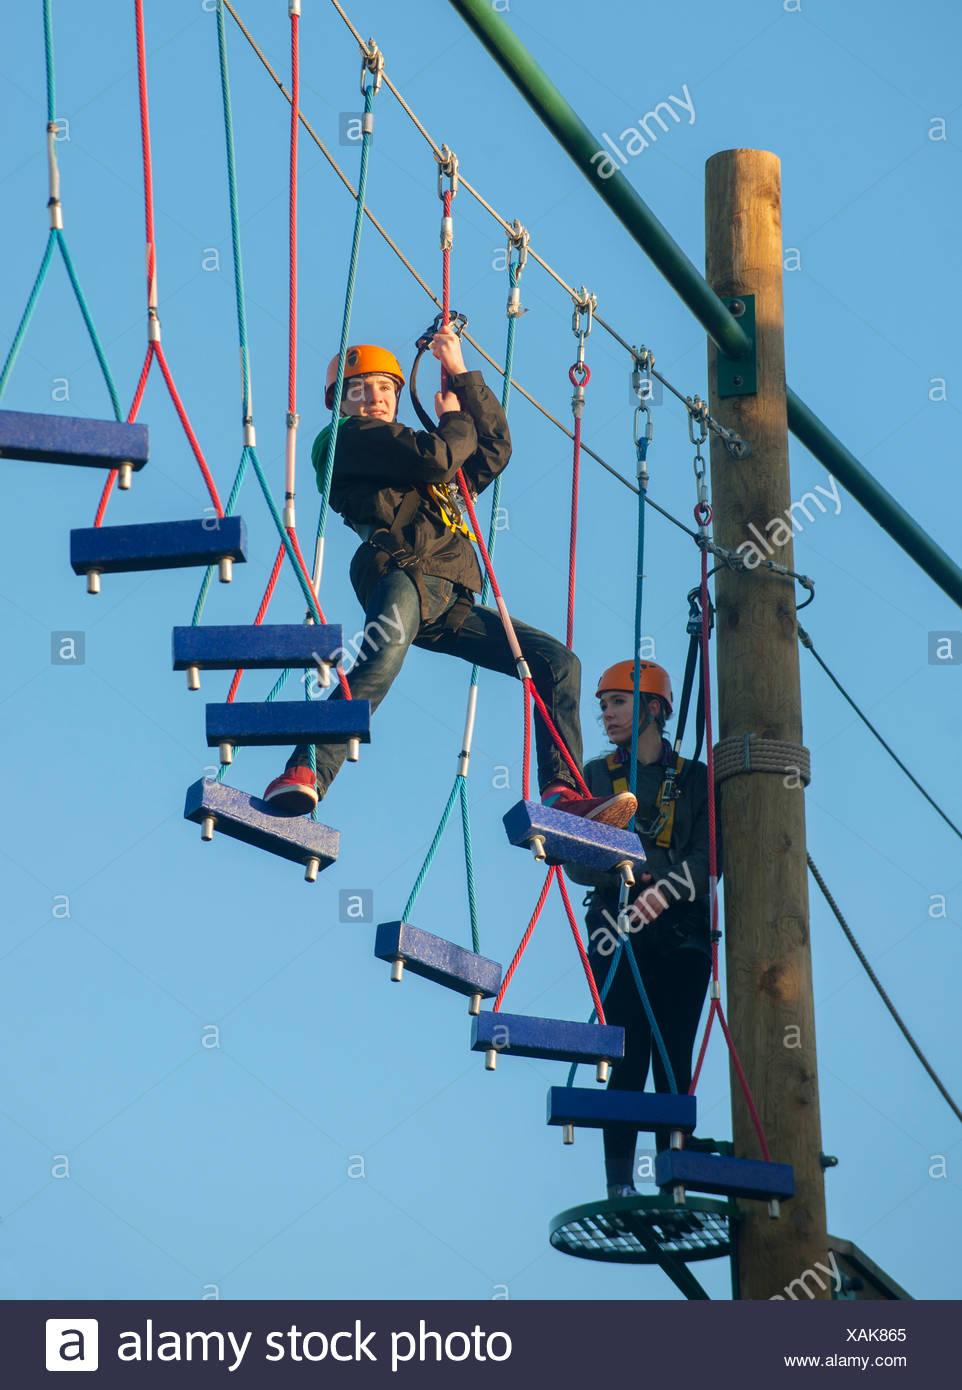 Klettern am Hindernis-Parcours im Teenageralter Stockbild